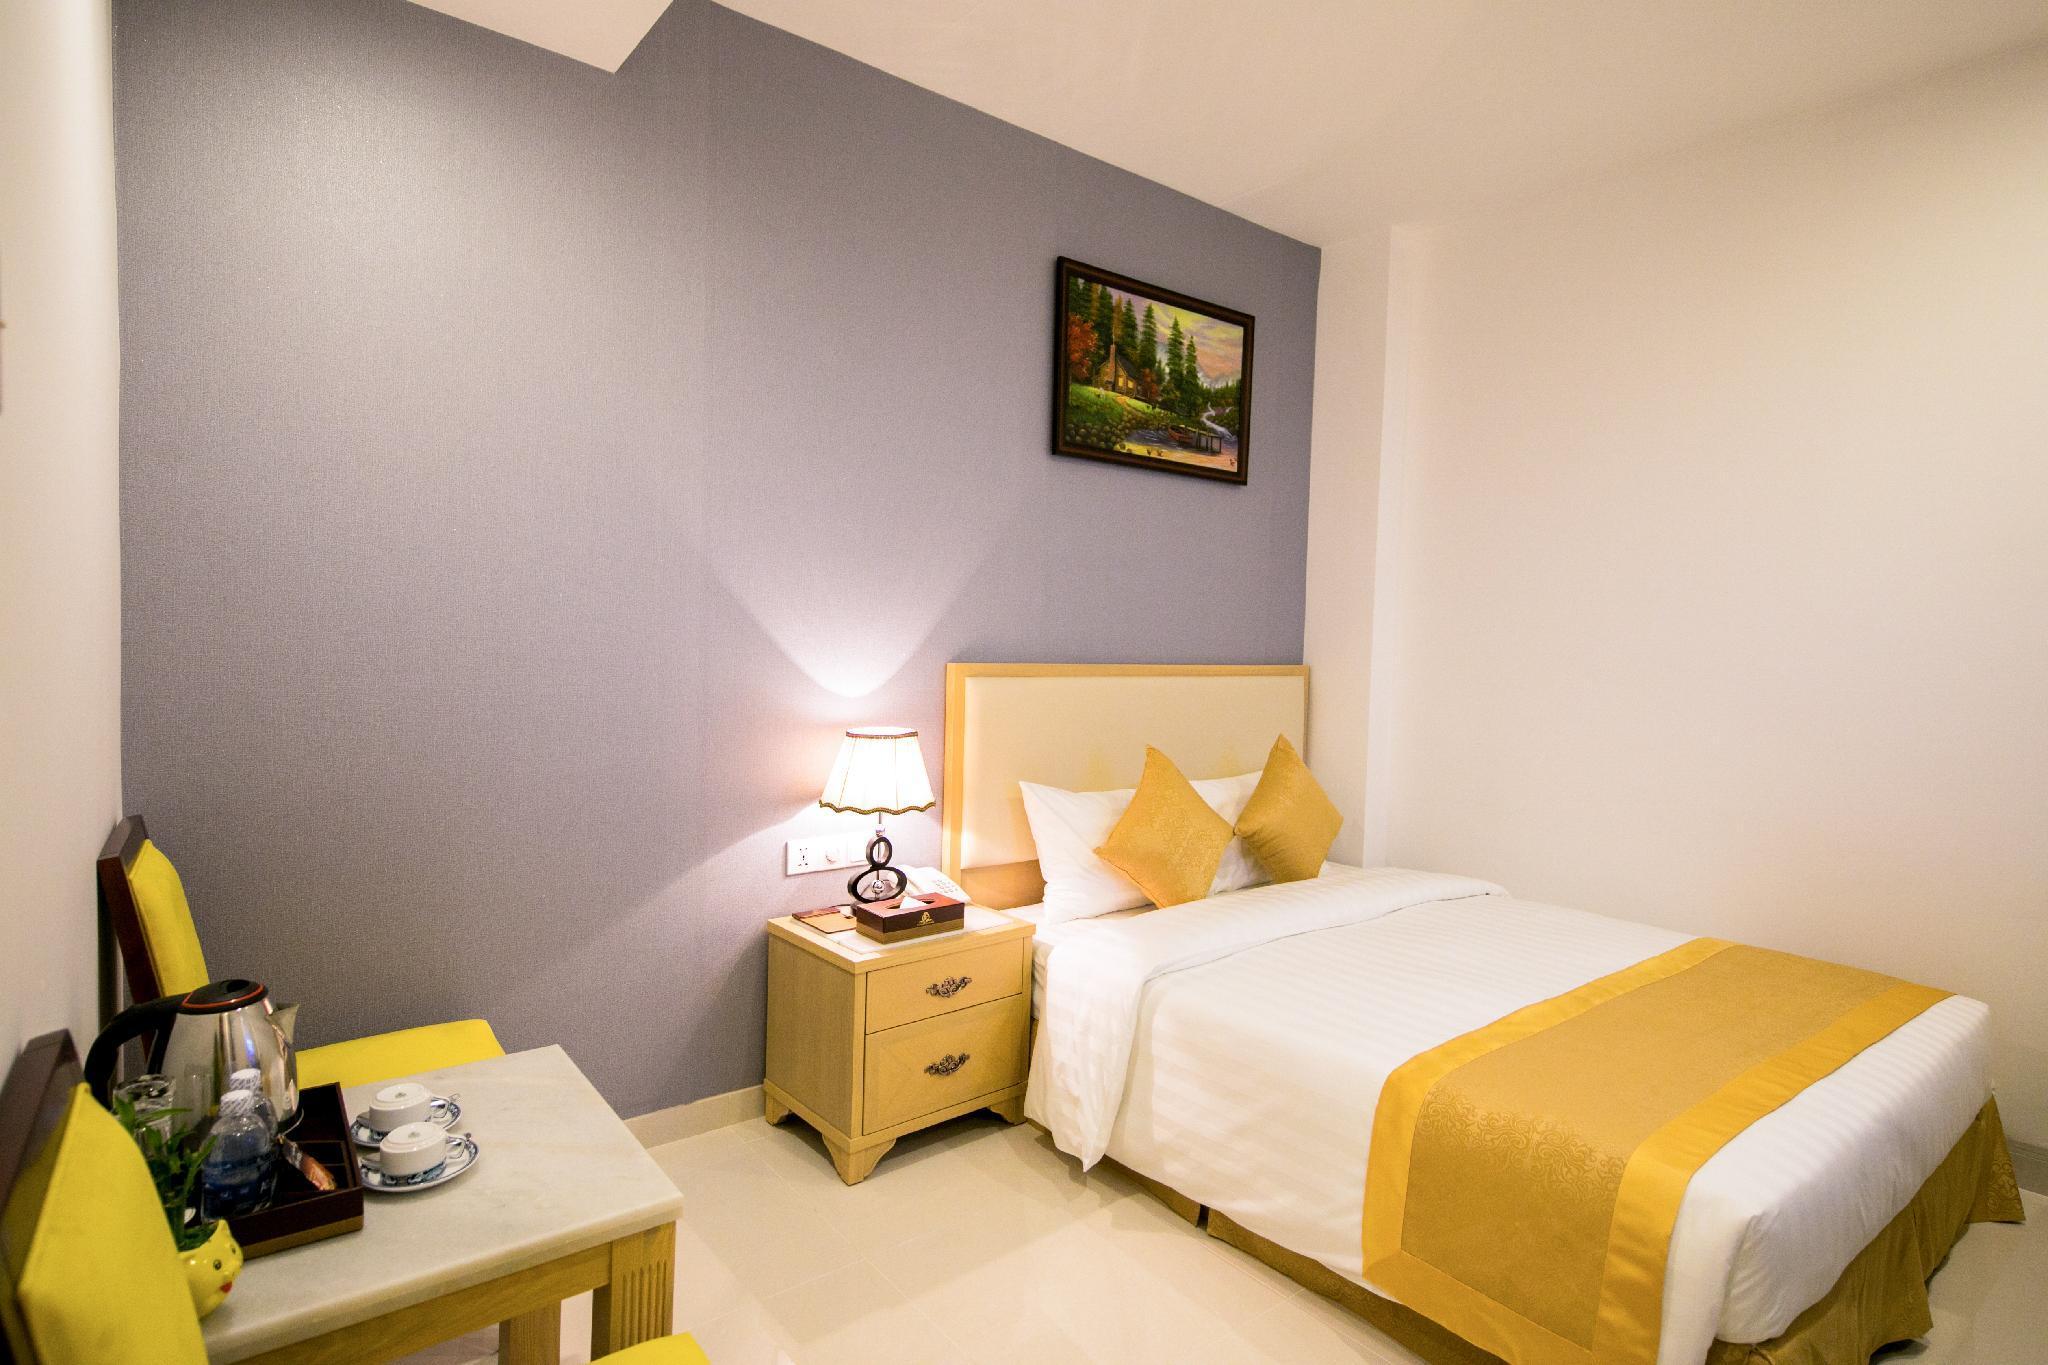 Le Saigon Hotel, Tân Bình